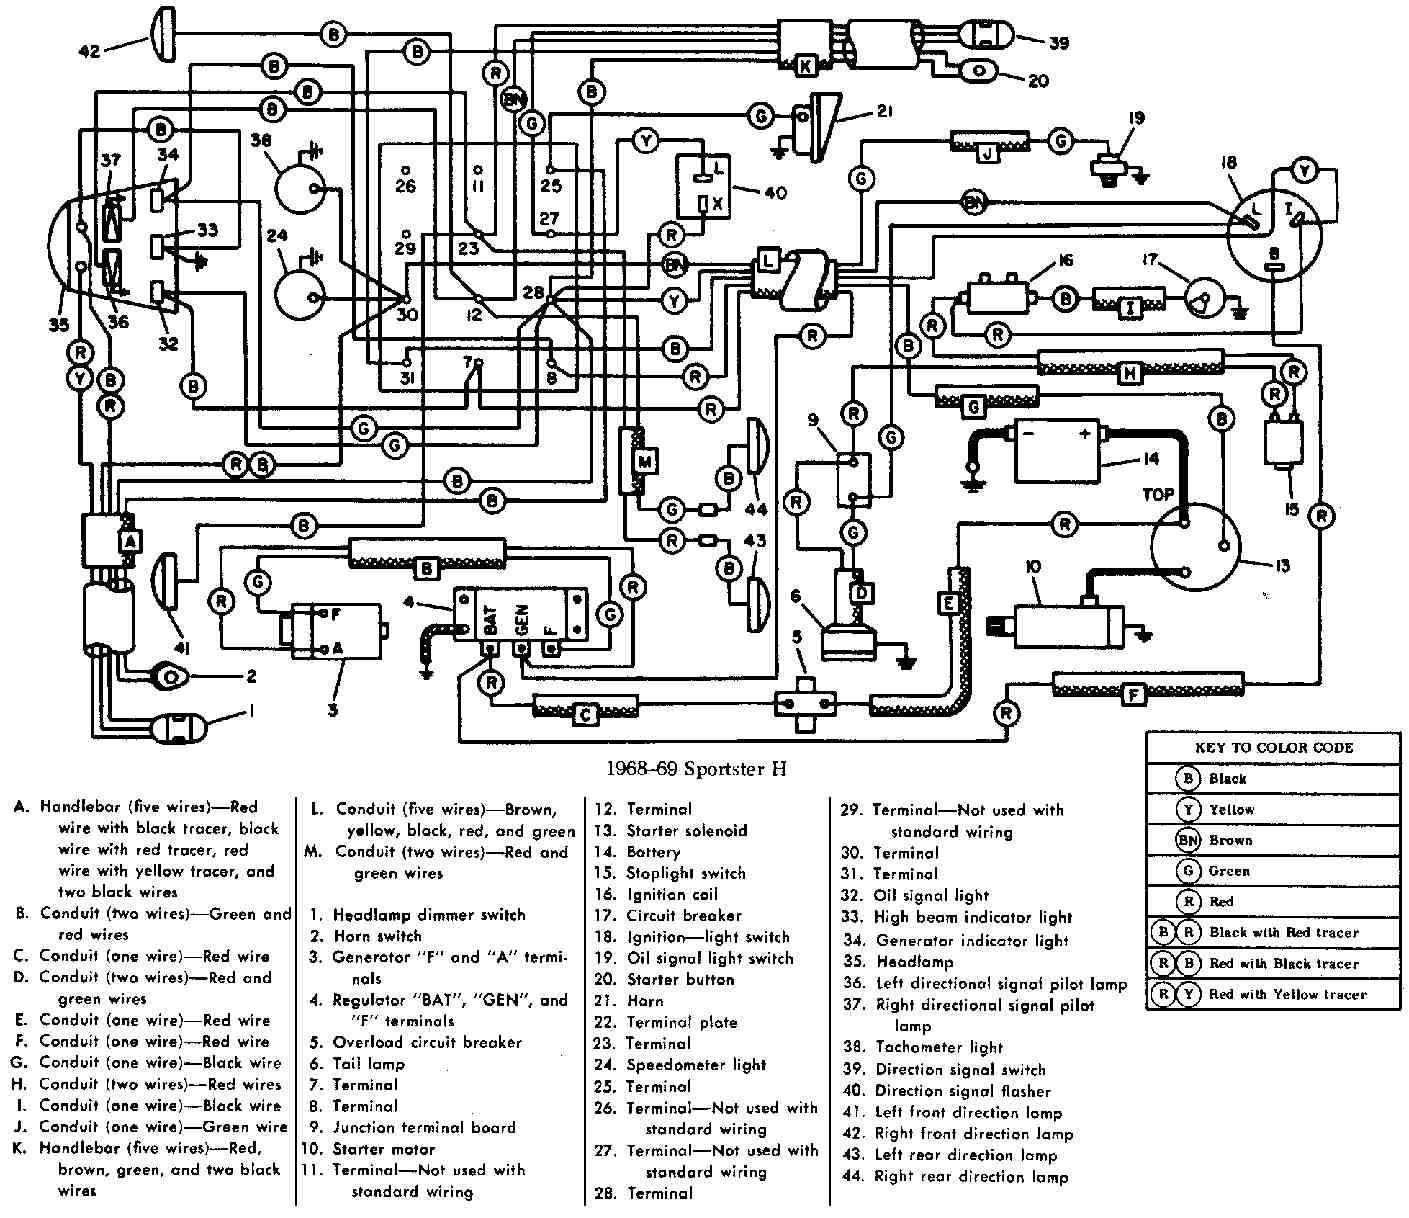 1990 flhtc wiring diagram 1990 fxstc wiring diagram wiring